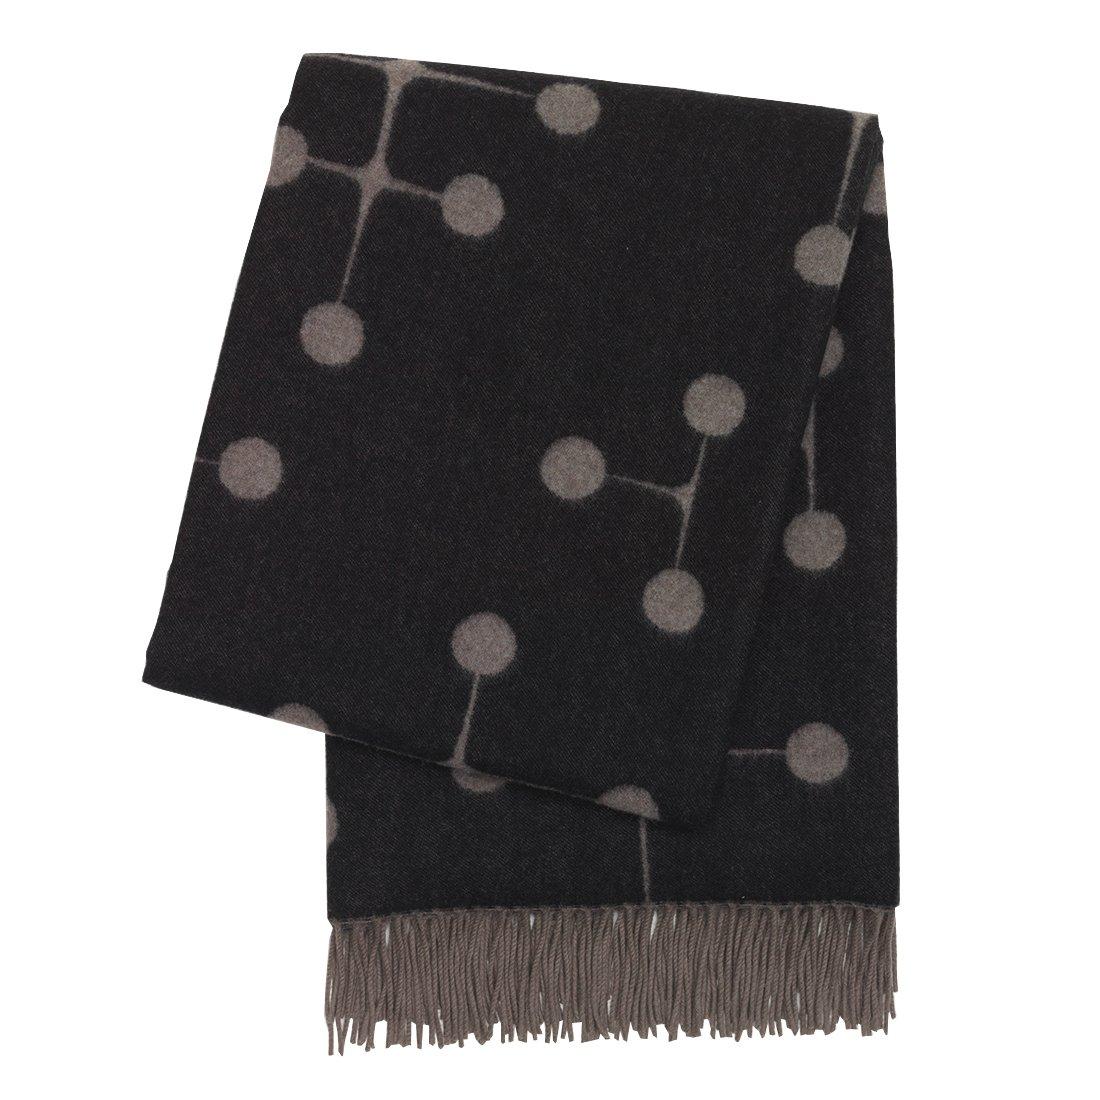 Vitra Eames Wool Deken Black